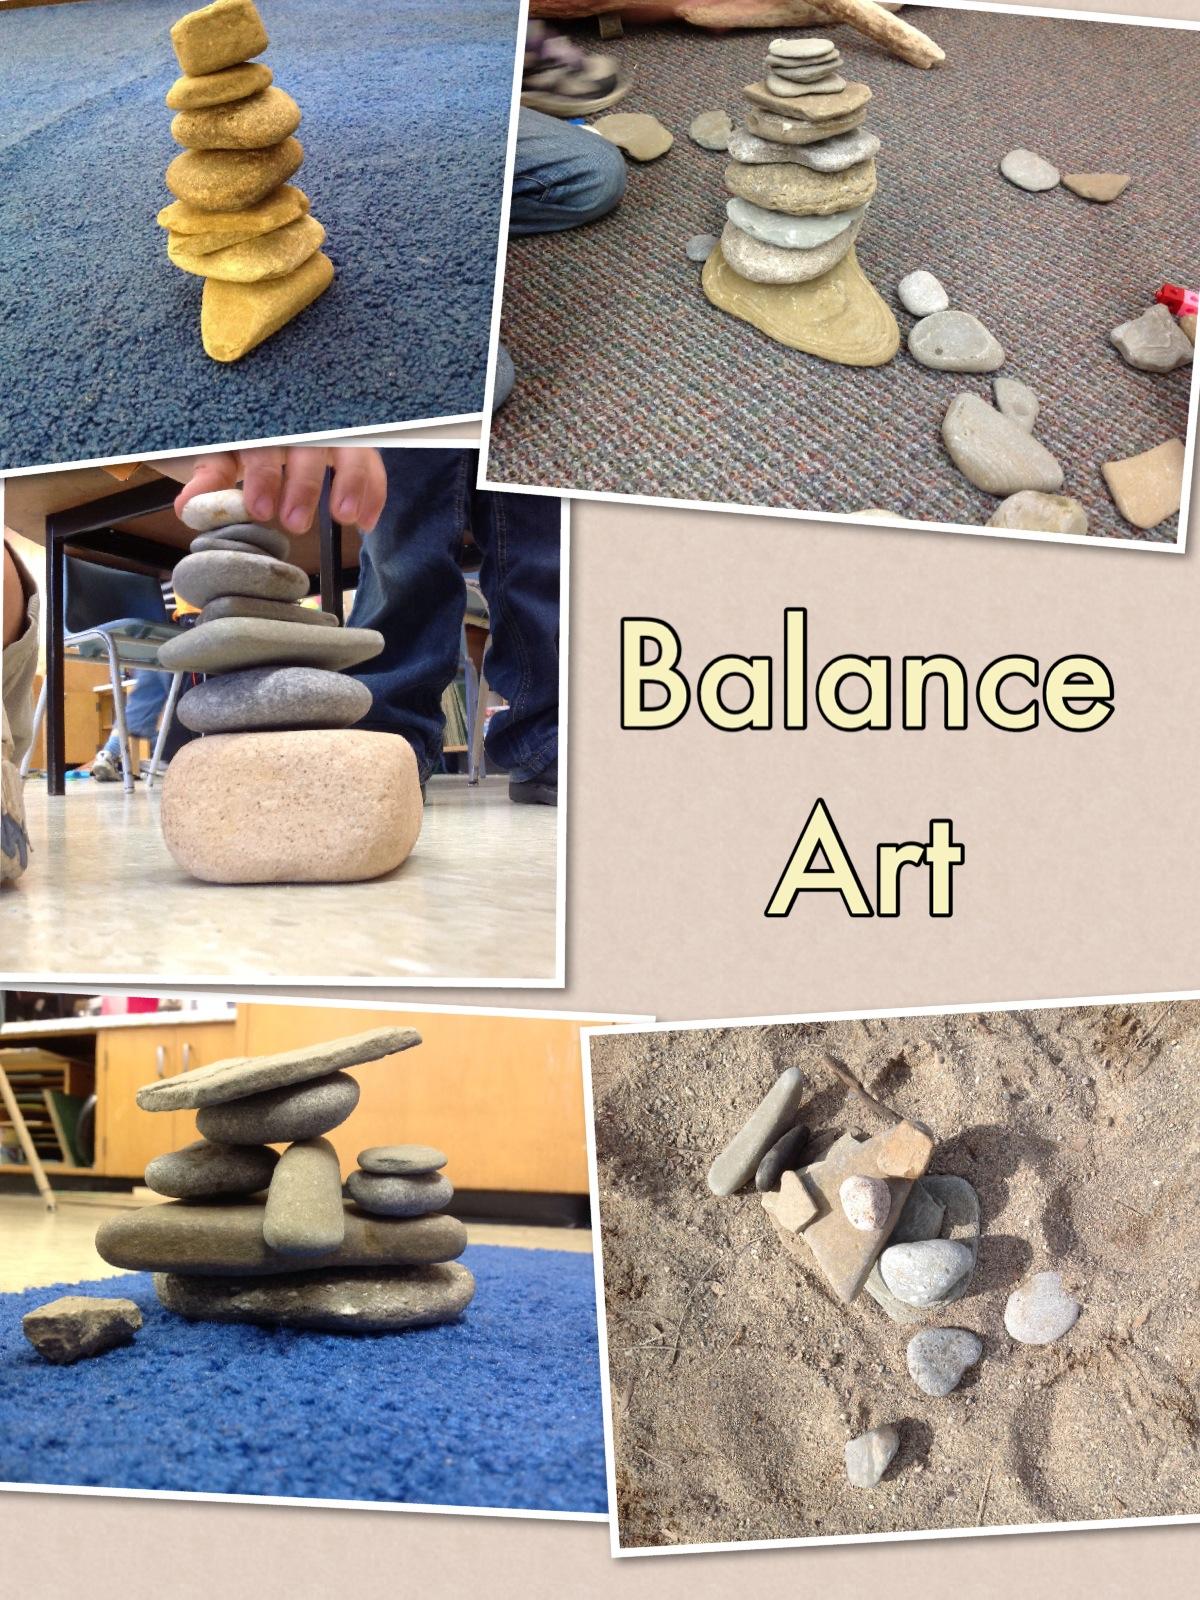 This Kindergarten Life Balance Pattern Rhythm And Awe